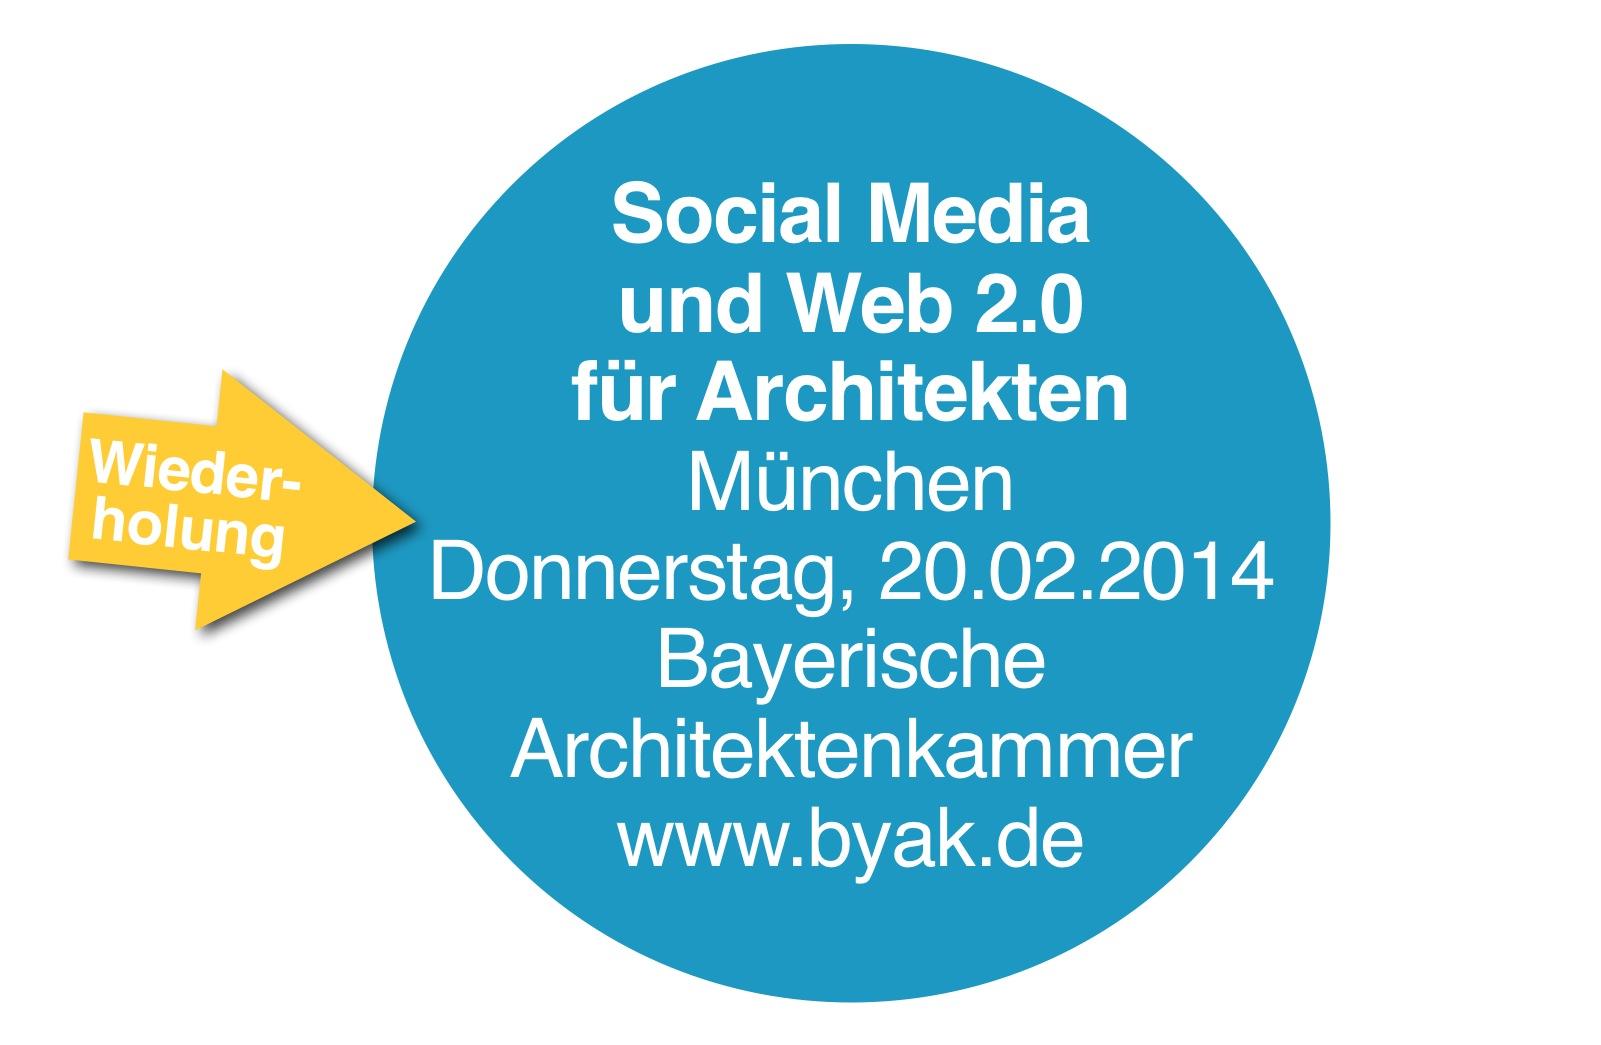 social media seminar in m nchen am internet f r architekten. Black Bedroom Furniture Sets. Home Design Ideas